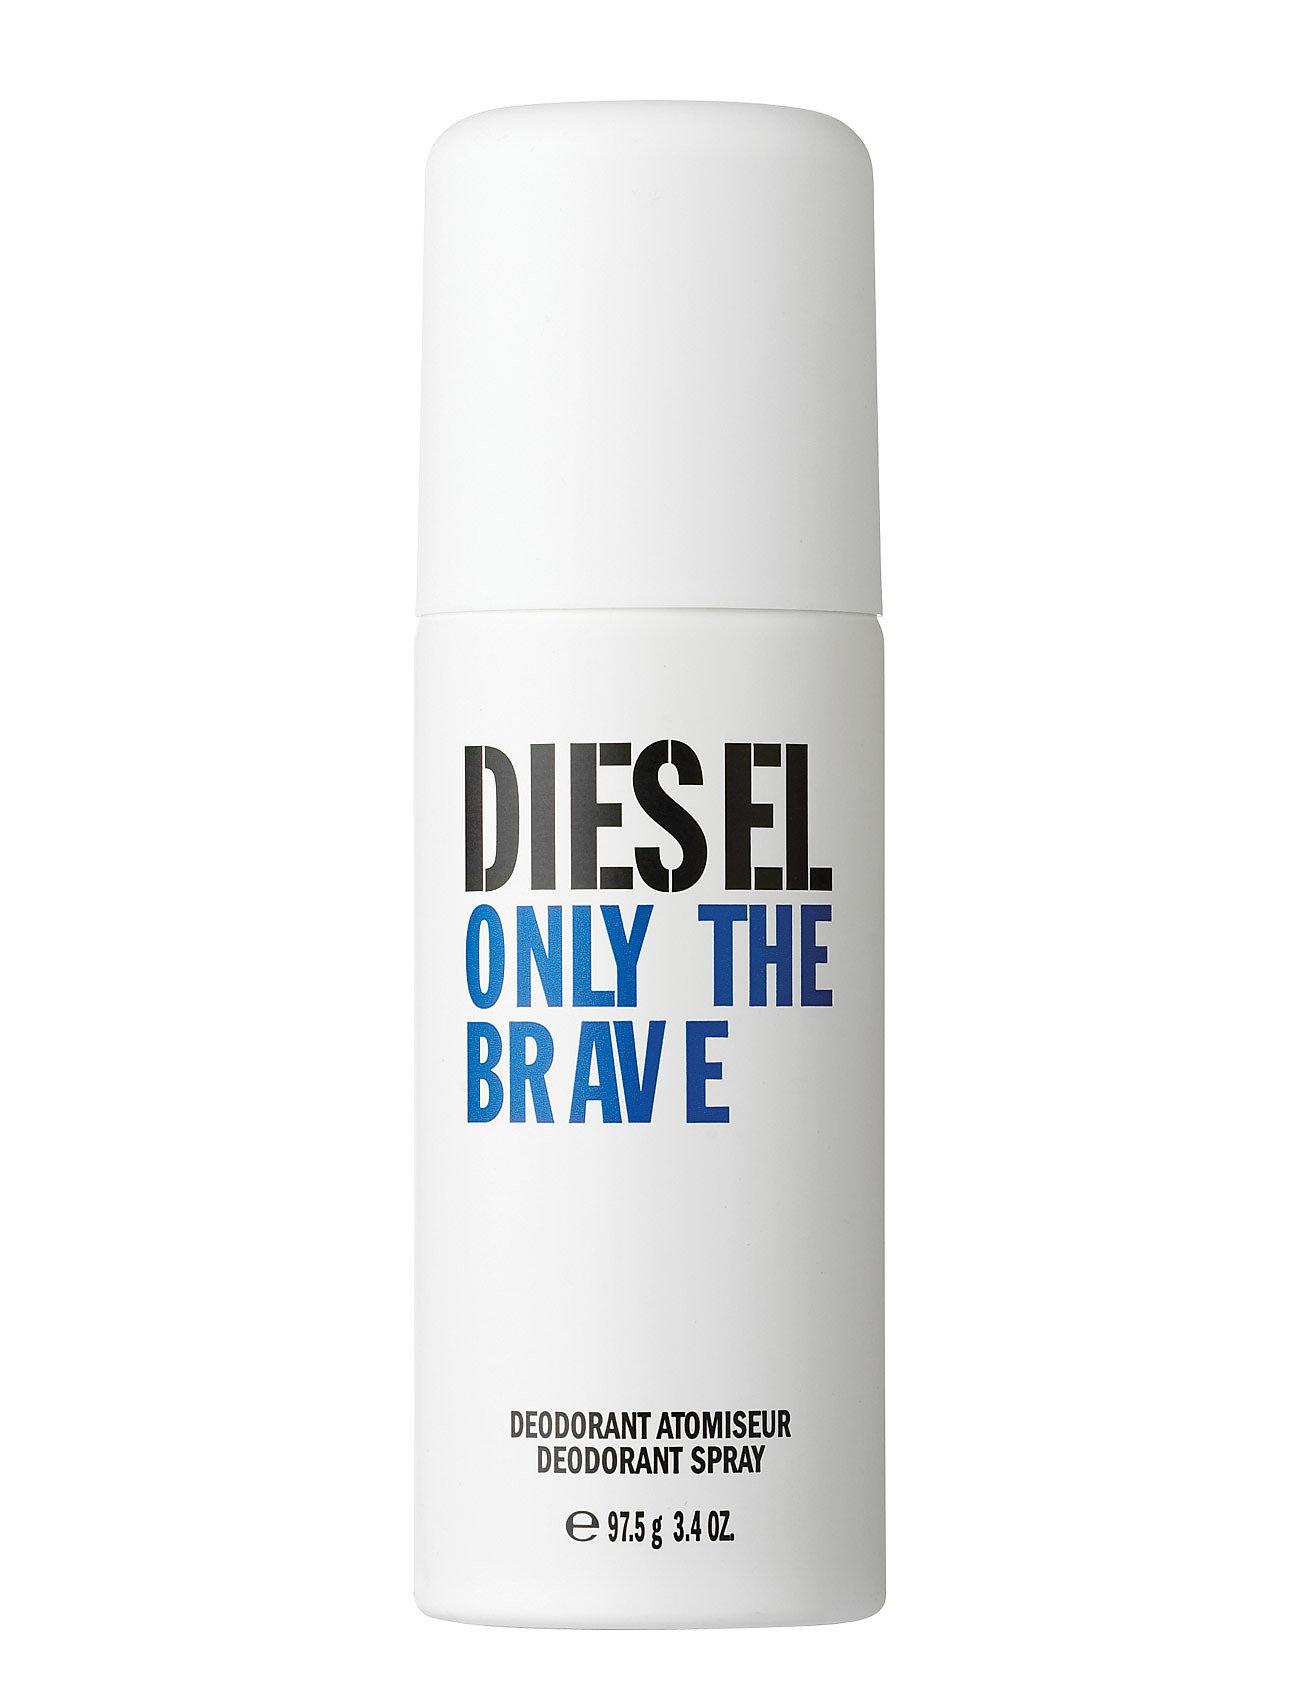 diesel - fragrance Diesel only the brave deodorant 150 ml på boozt.com dk